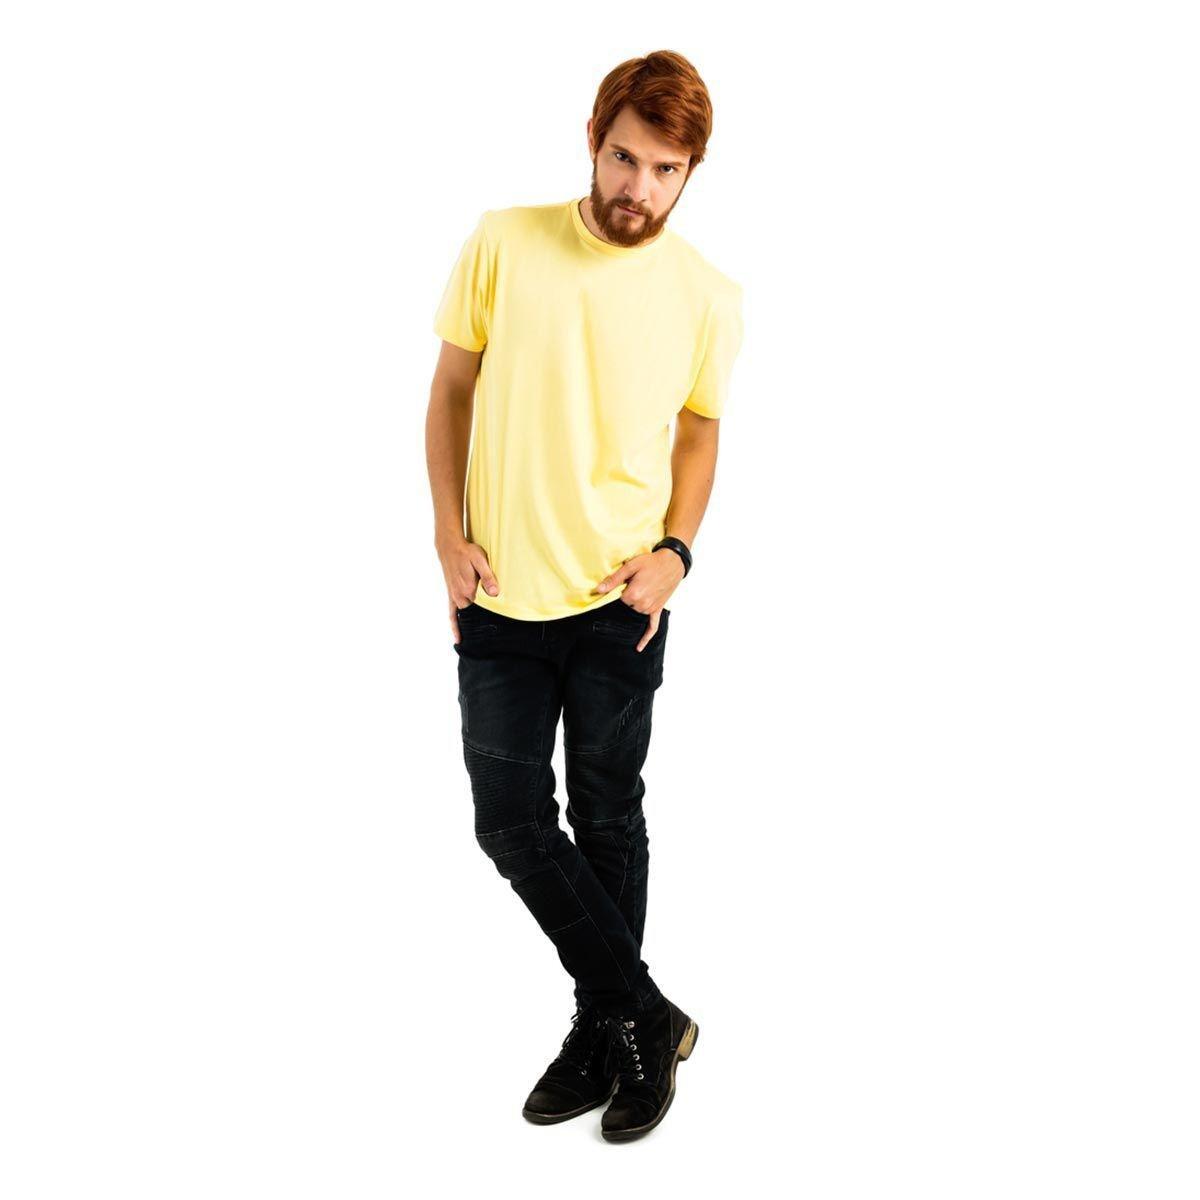 Camiseta AES 1975 Básica Masculina - Amarelo